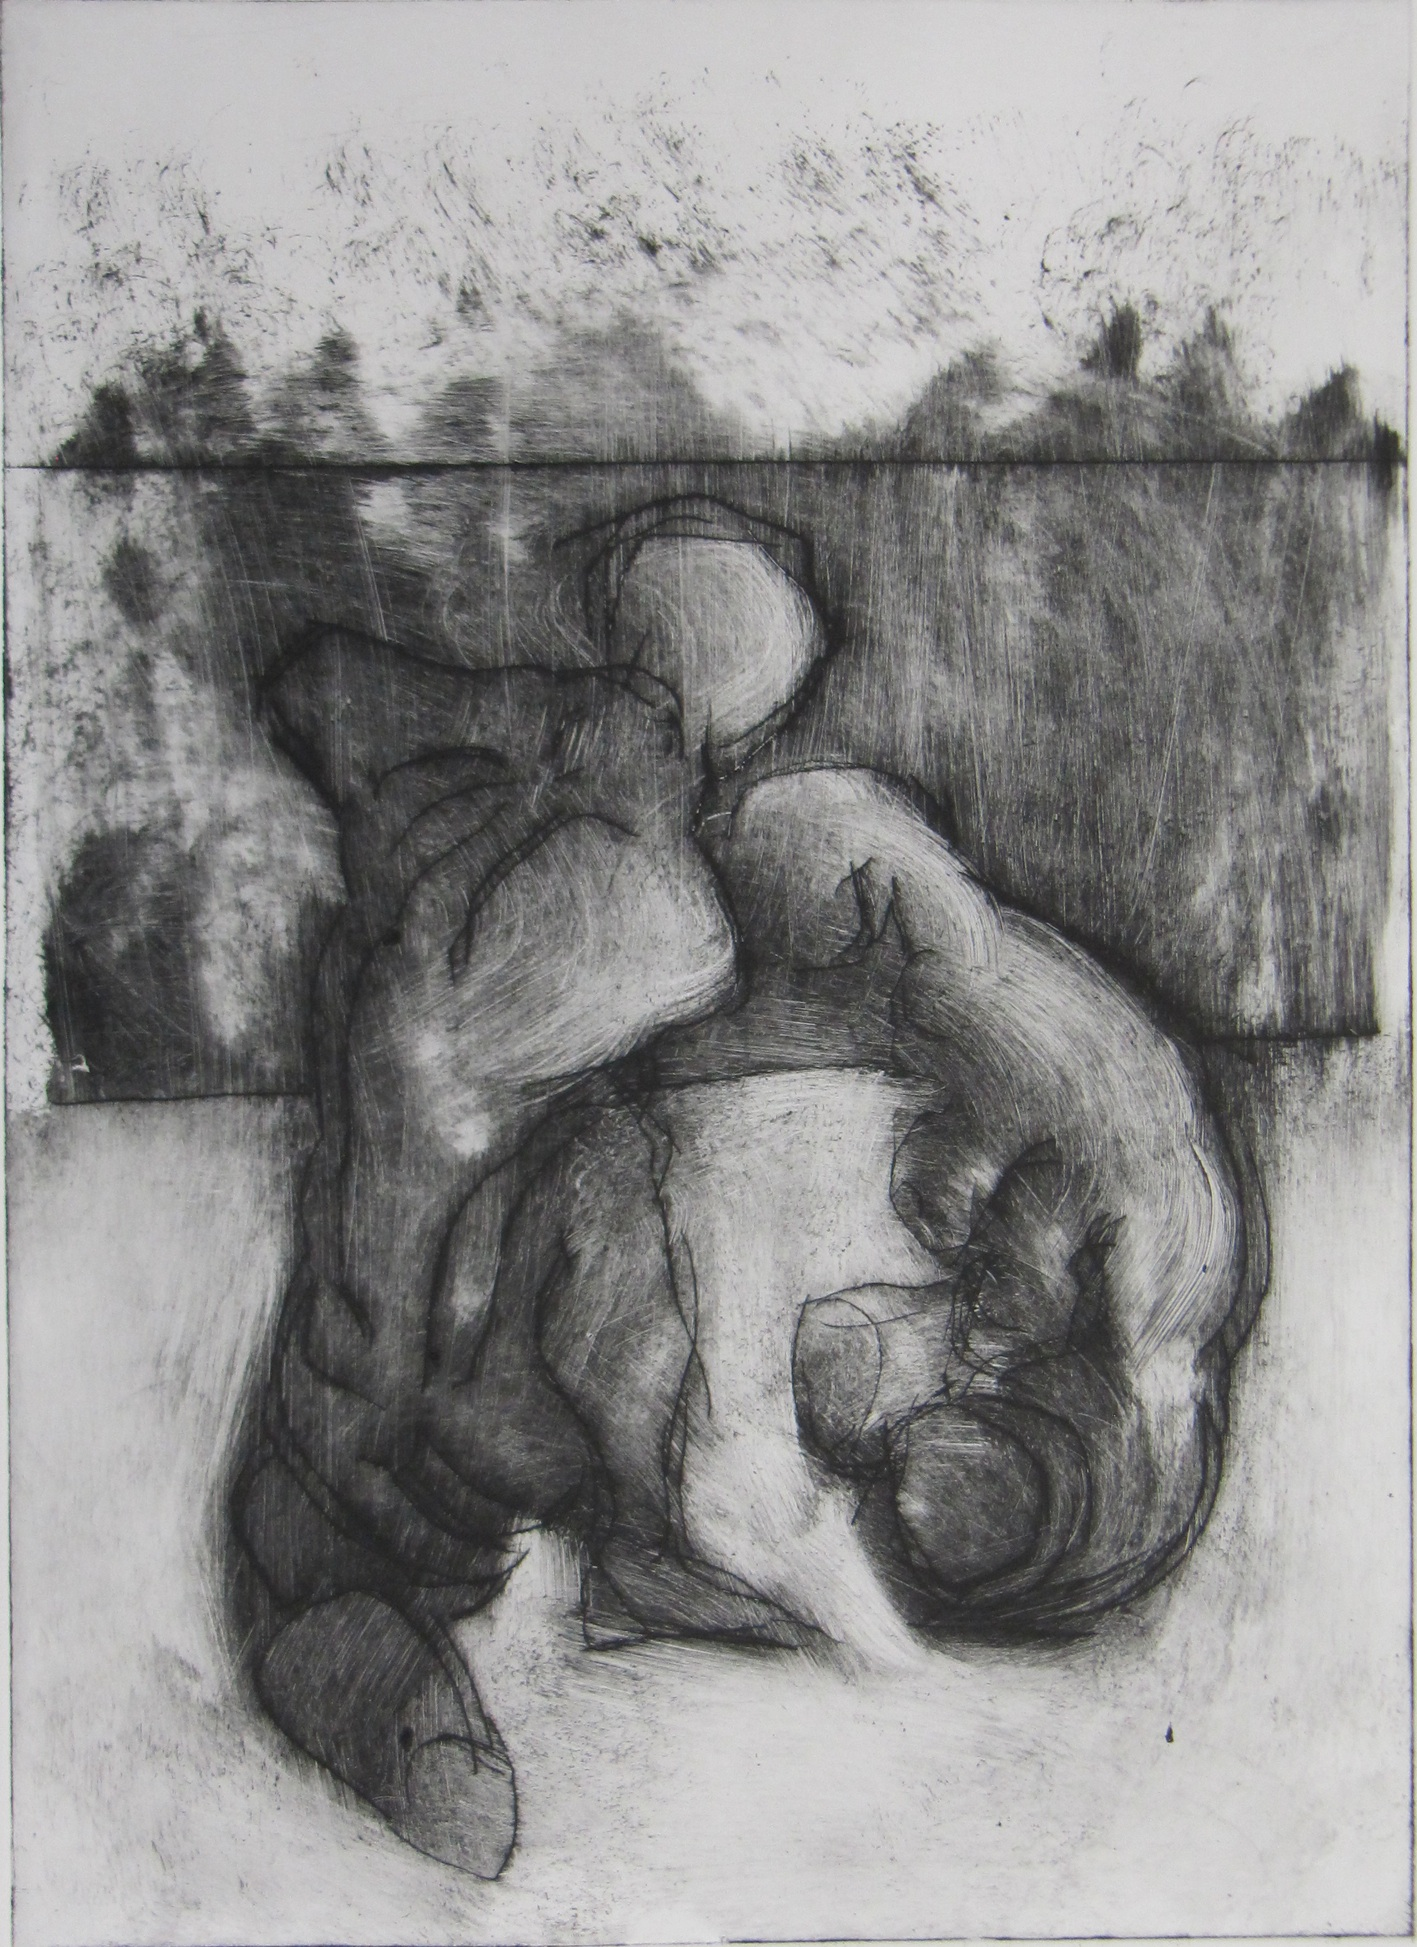 Kaspar Toggenburger, «Torso«, 2019, Kaltnadel, individuell ausgewischt, Unikat, 55,5 x 38 cm © Kaspar Toggenburger